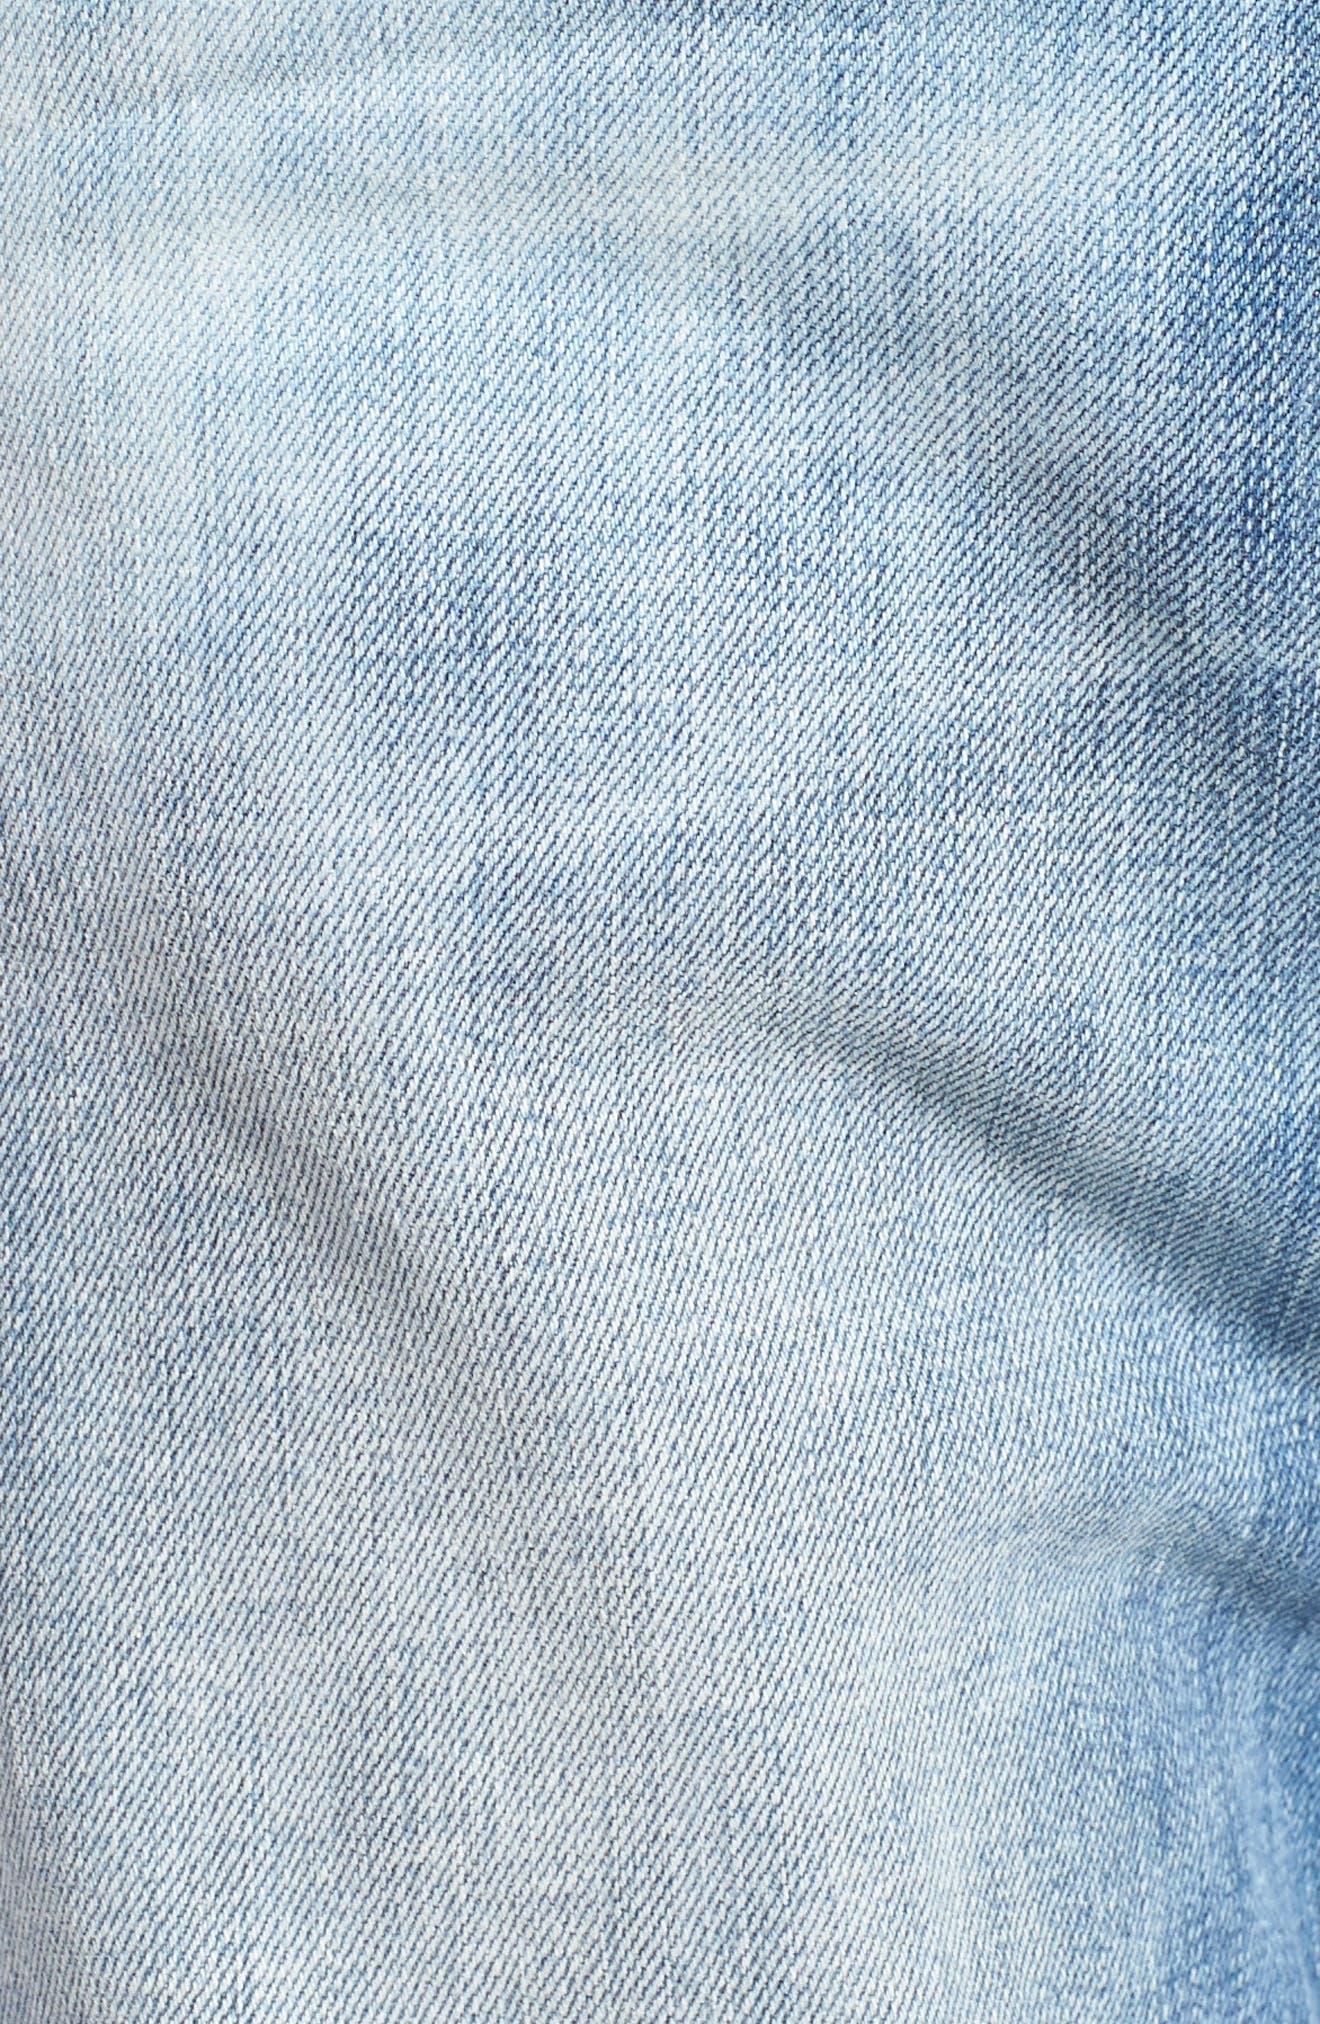 Blinder Skinny Fit Moto Jeans,                             Alternate thumbnail 5, color,                             429